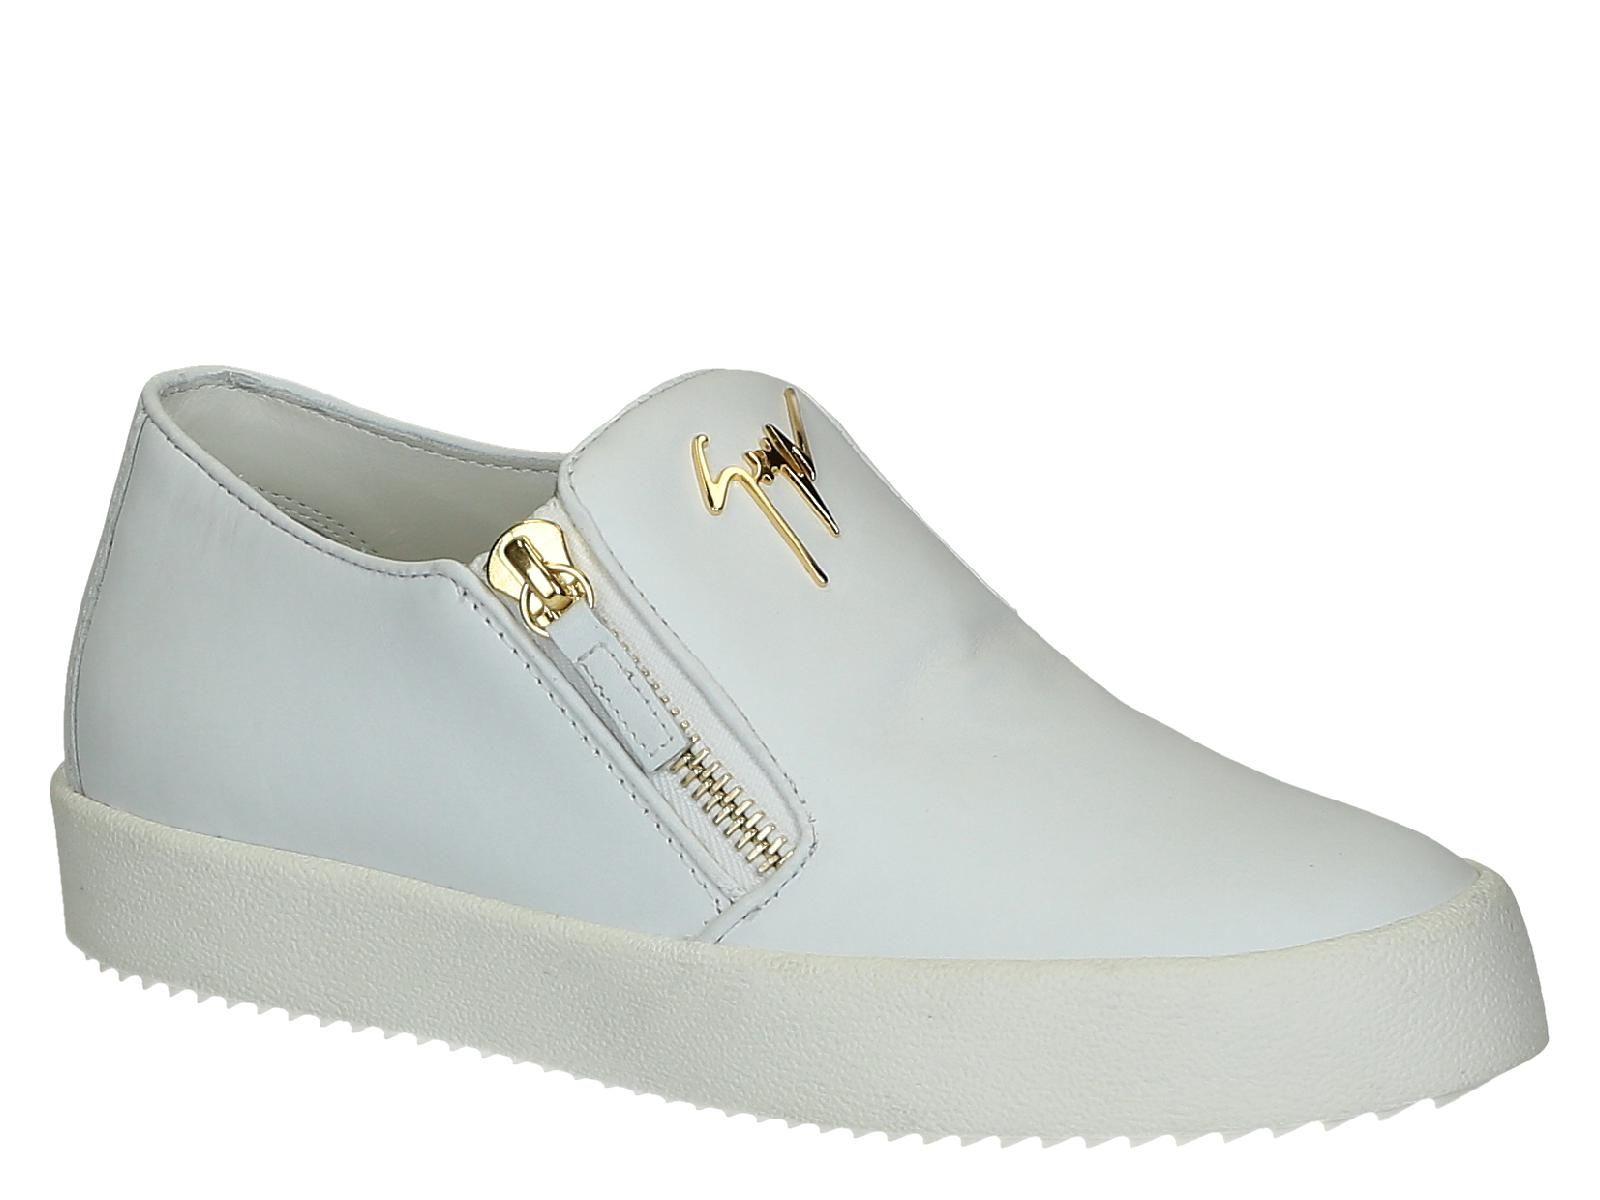 Giuseppe Zanotti flat sneakers in white